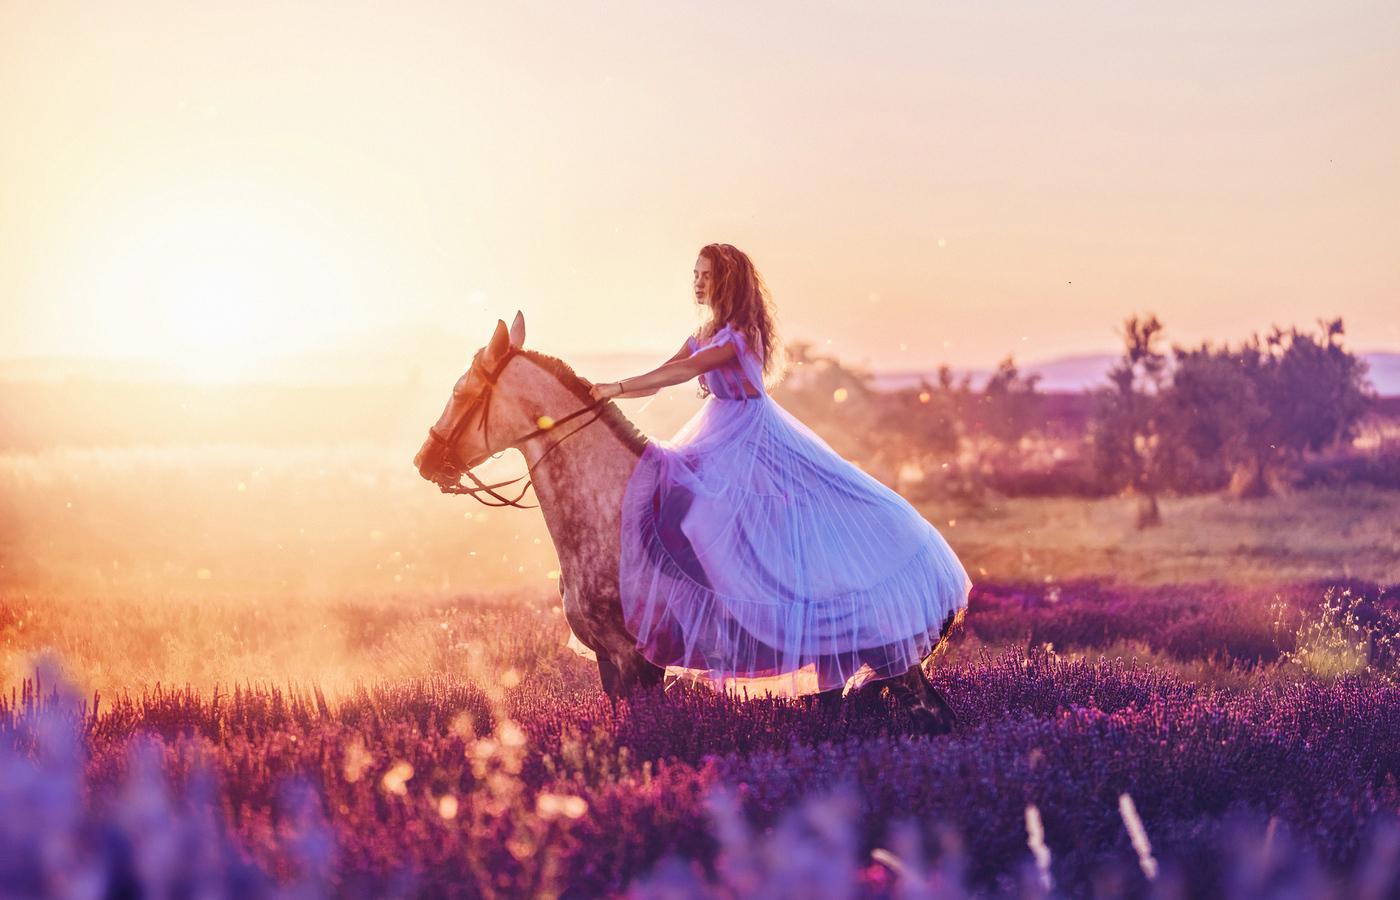 women-with-horse-fantasy-field-4k-ni.jpg